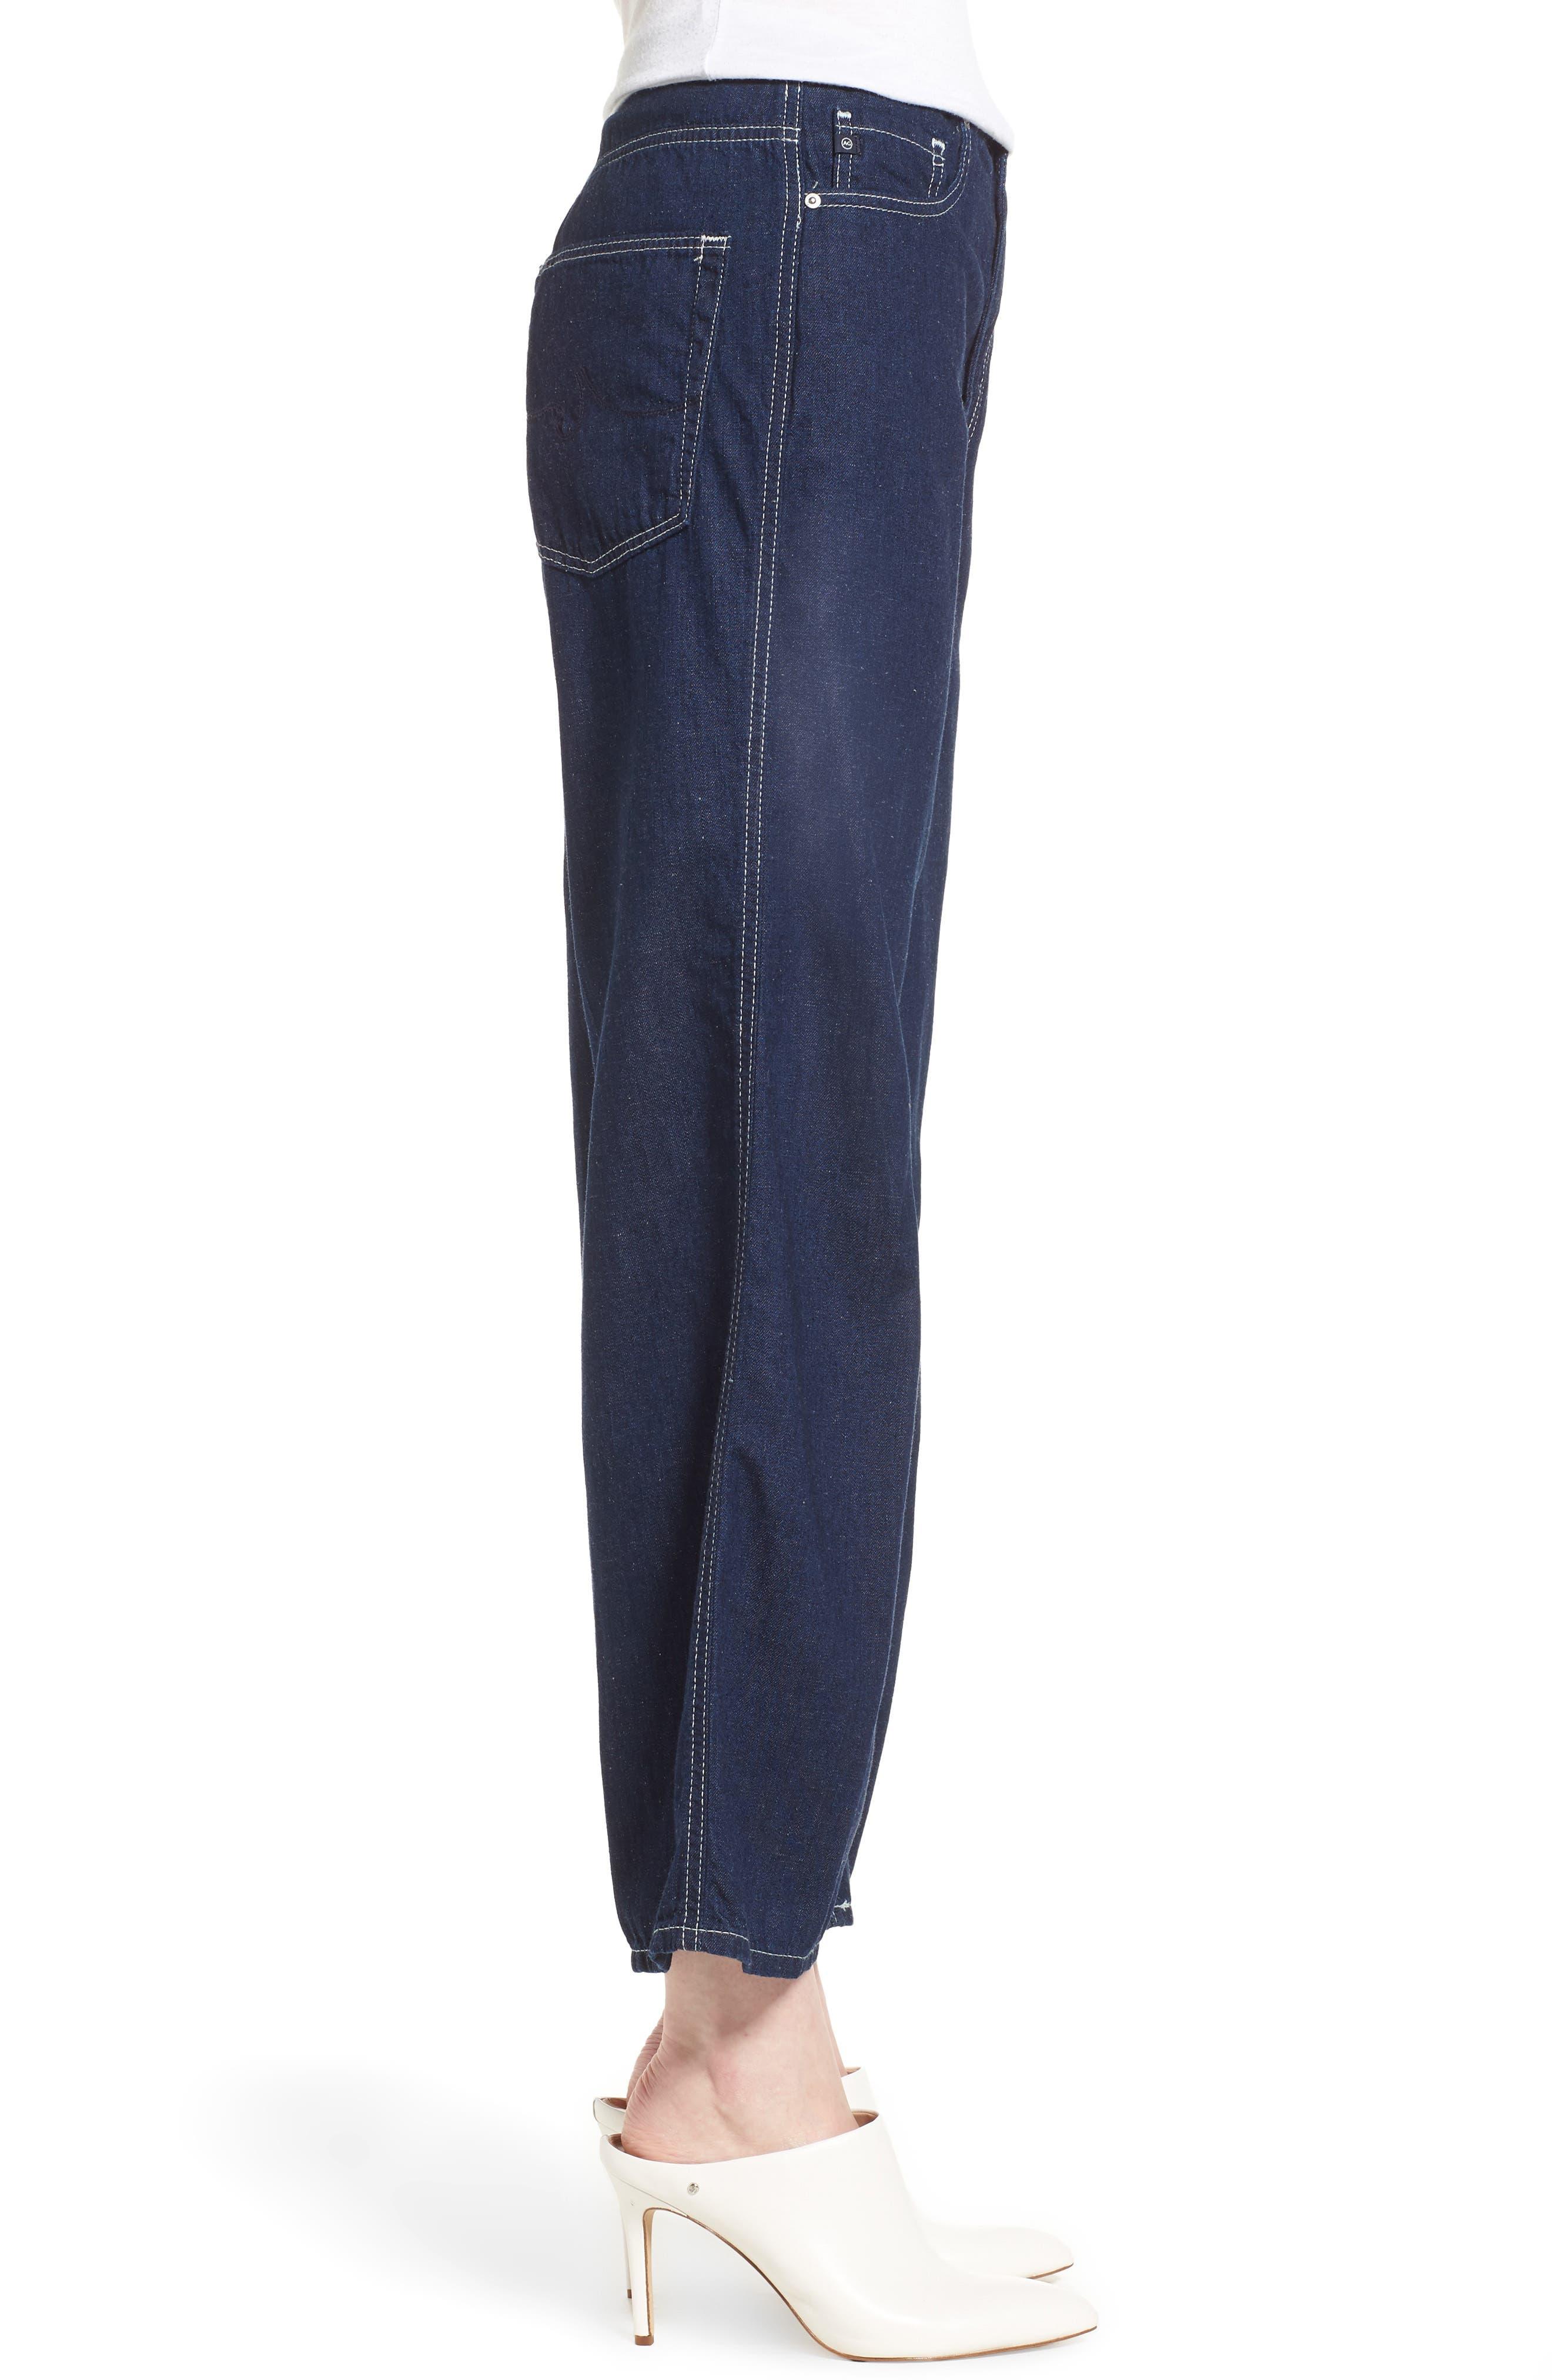 Etta High Waist Crop Wide Leg Jeans,                             Alternate thumbnail 3, color,                             Midnight Surge